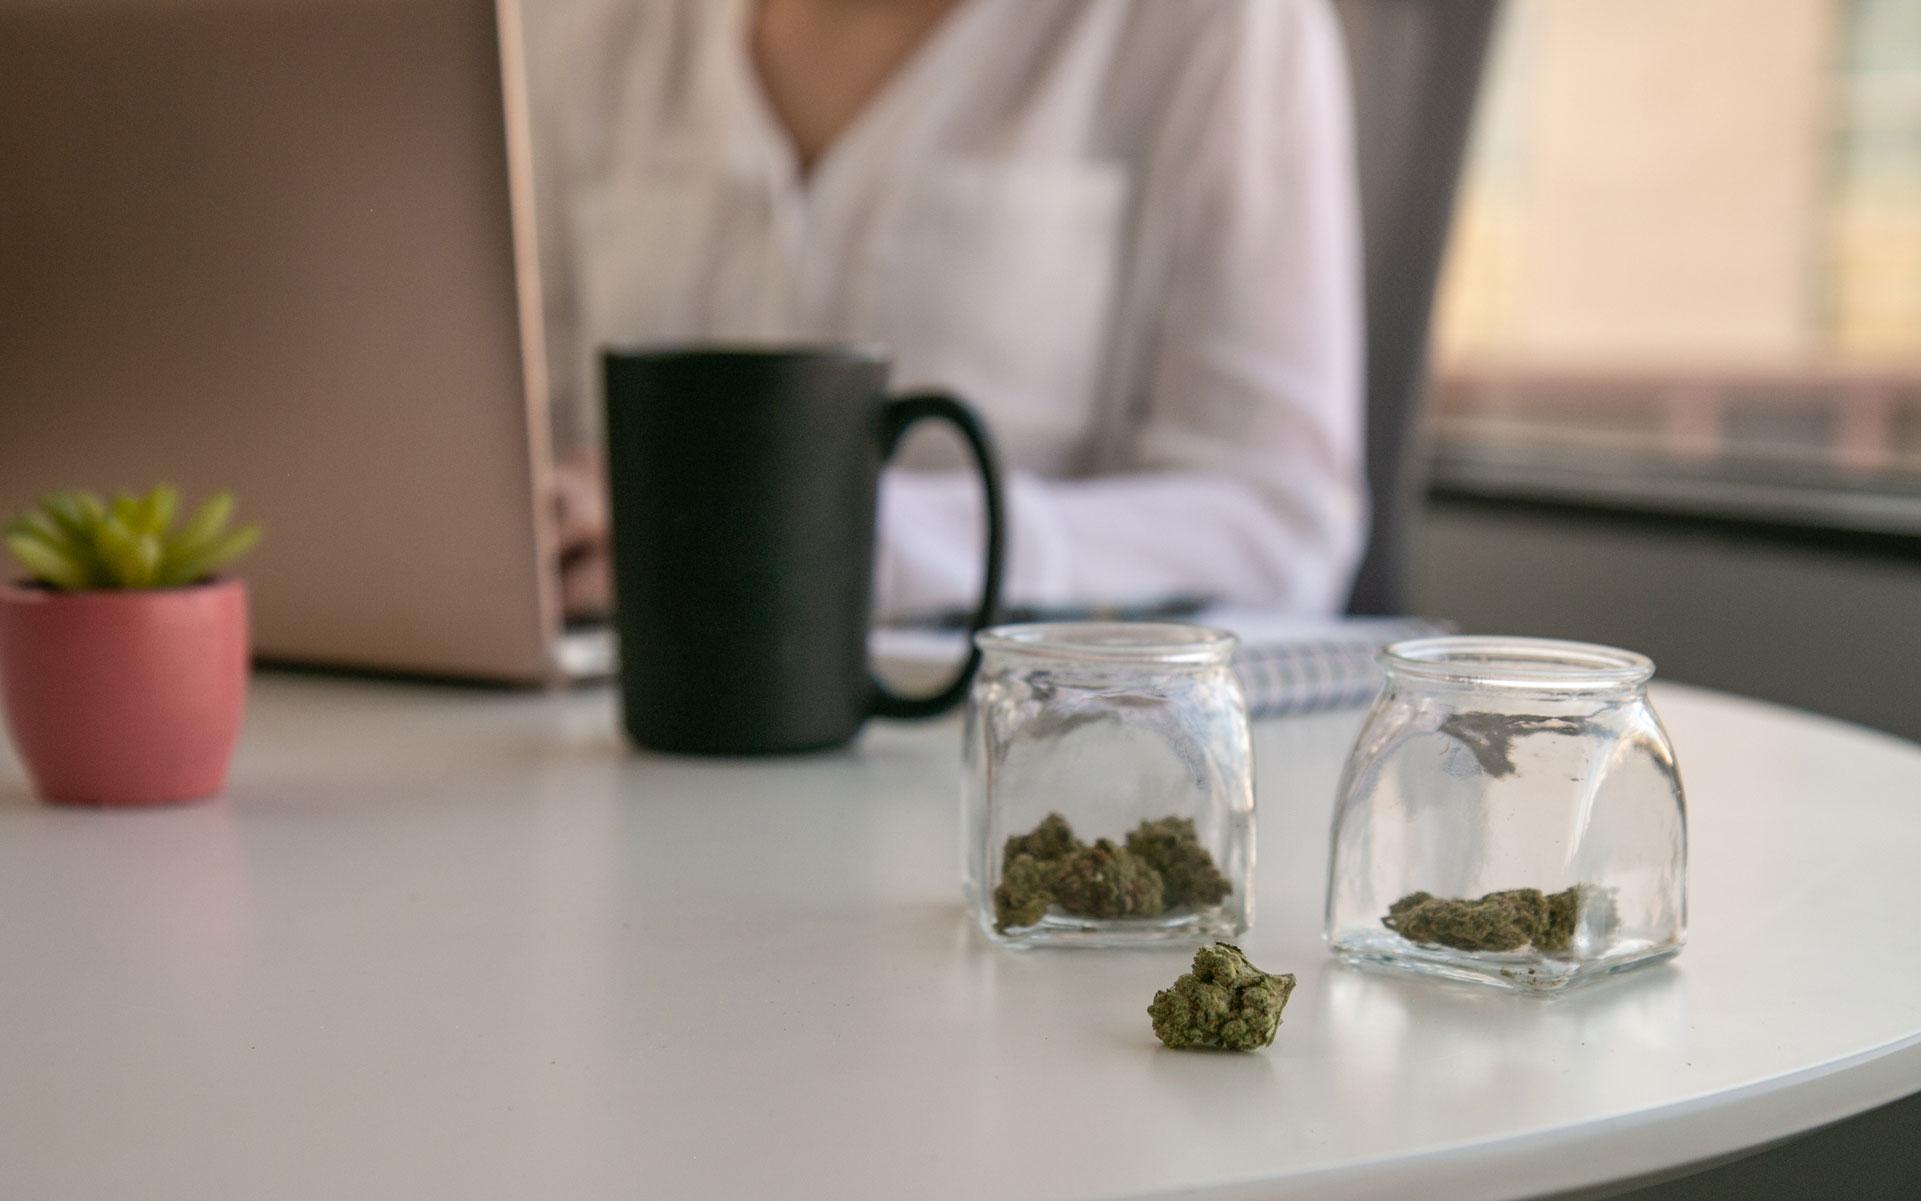 StatsCan: Over Half a Million Canadians Use Cannabis at Work thumbnail